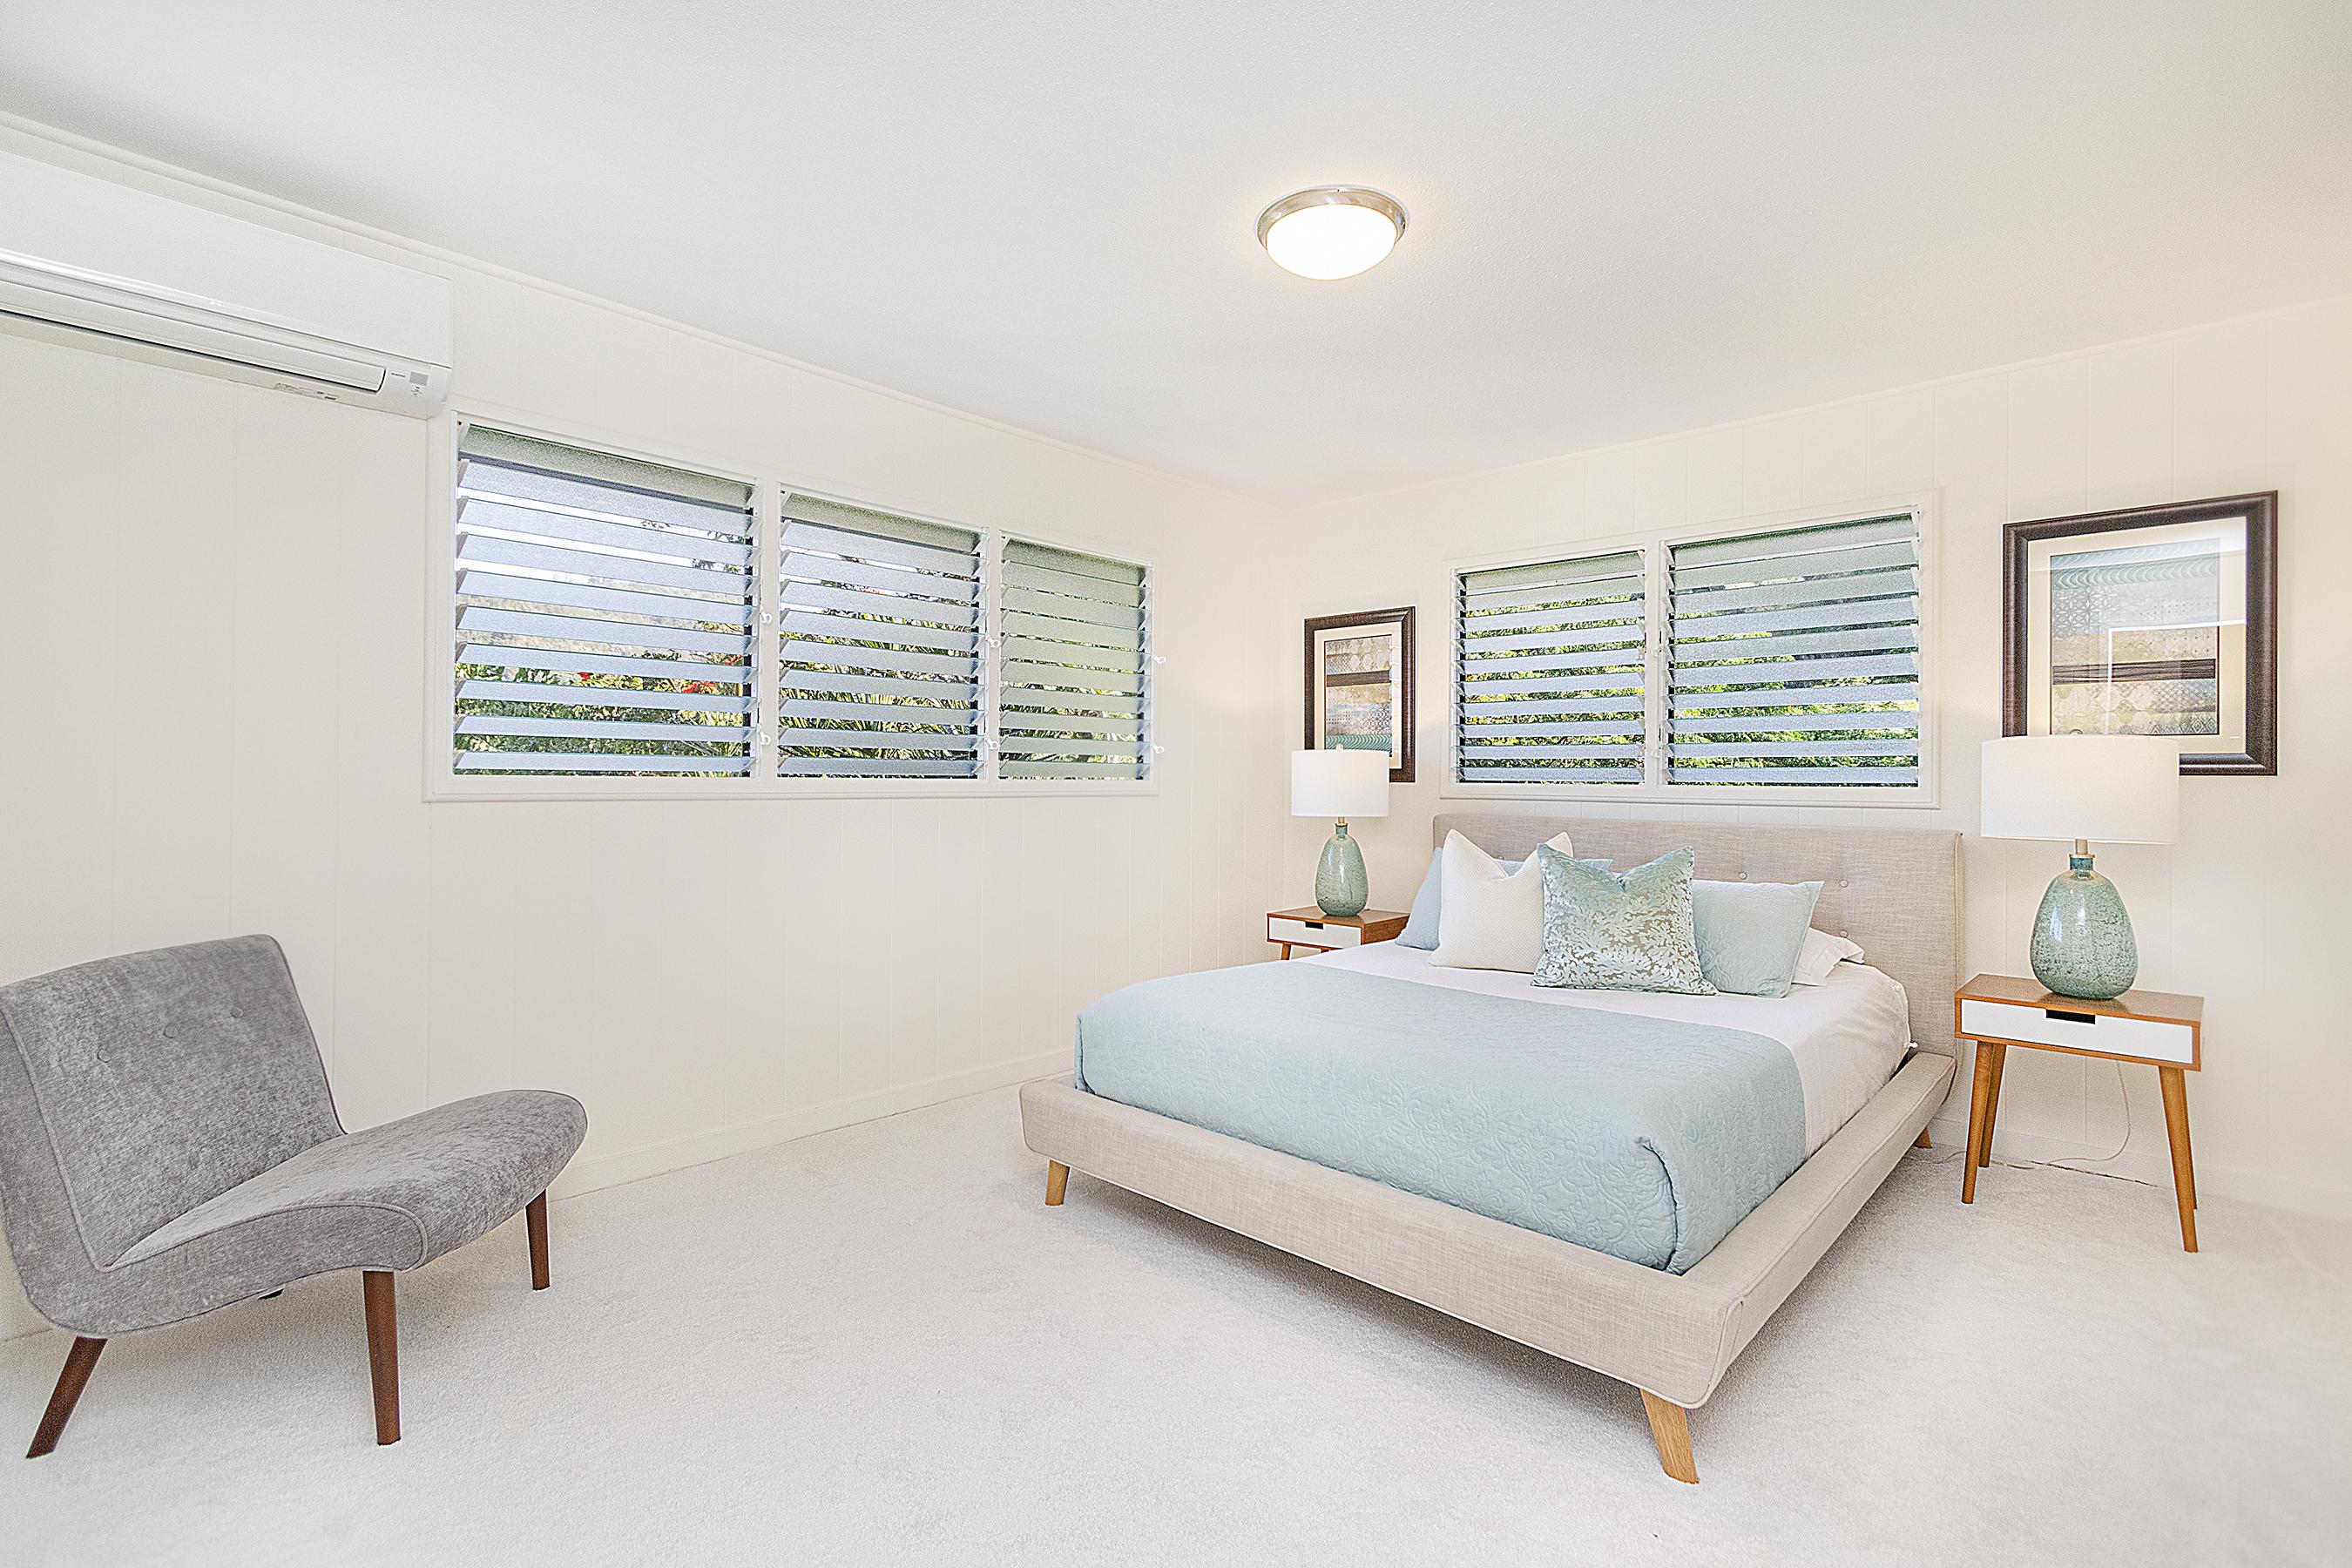 First Bedroom at 380 Puiwa Road, Honolulu, HI 96817